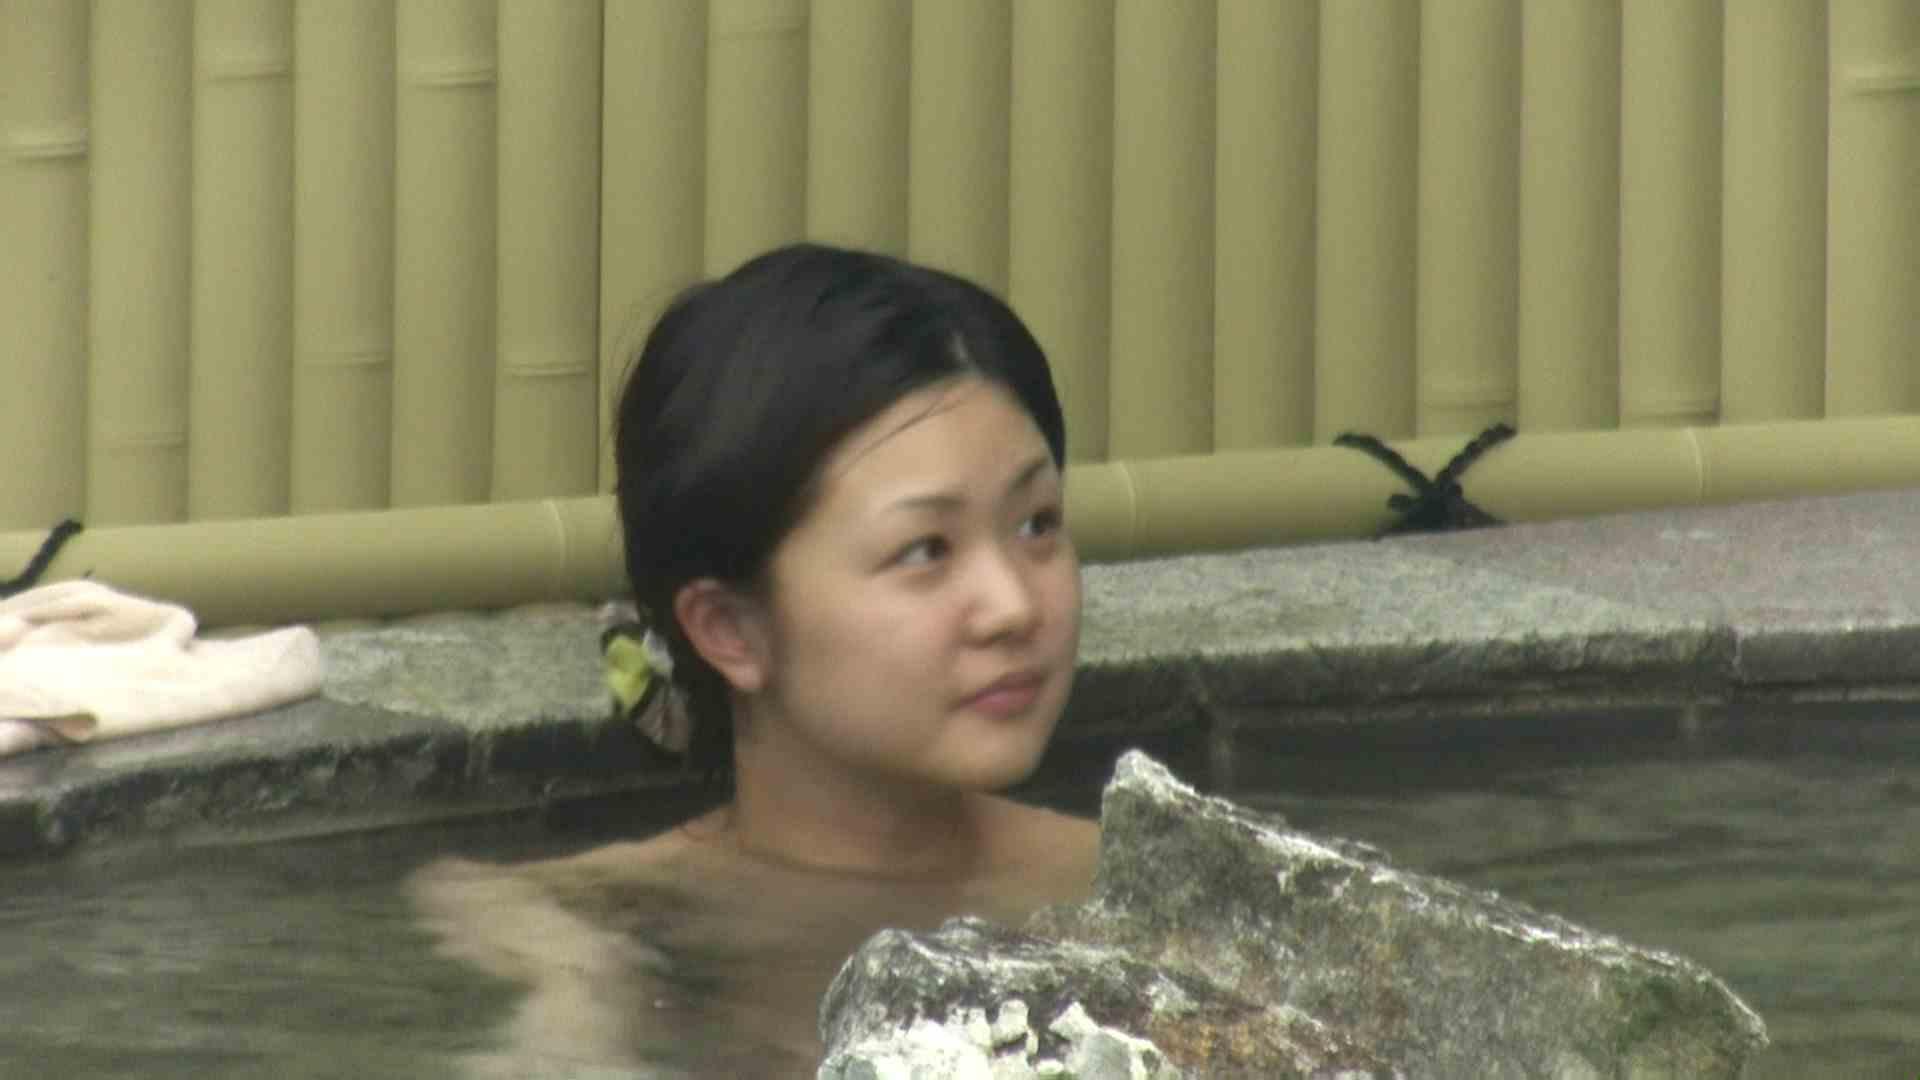 高画質露天女風呂観察 vol.032 Hな乙女 オマンコ無修正動画無料 103pic 23